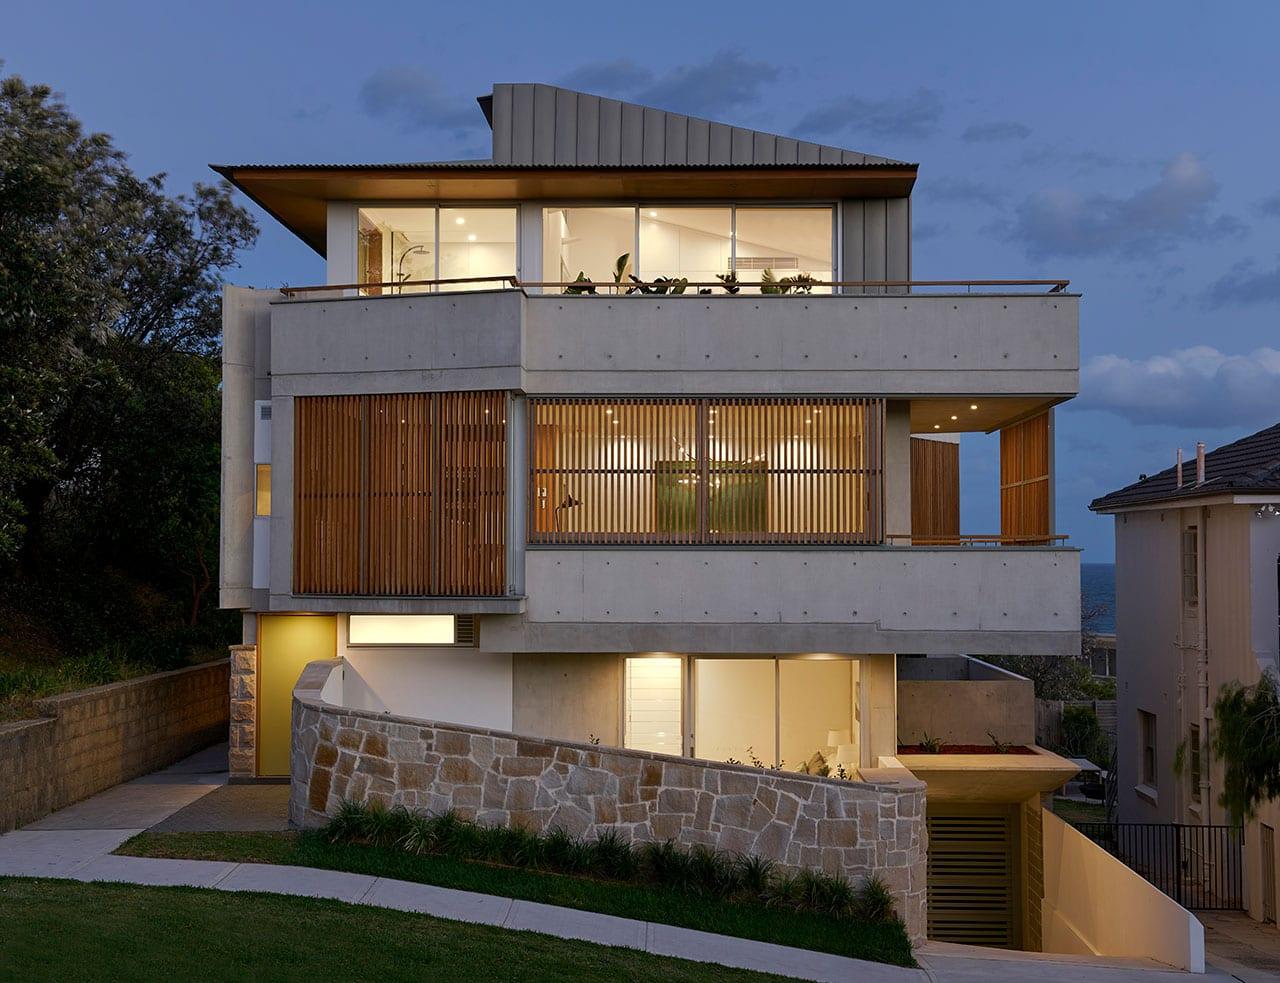 Tamarama Townhouses by David Mitchell Architects and Chapman Architecture